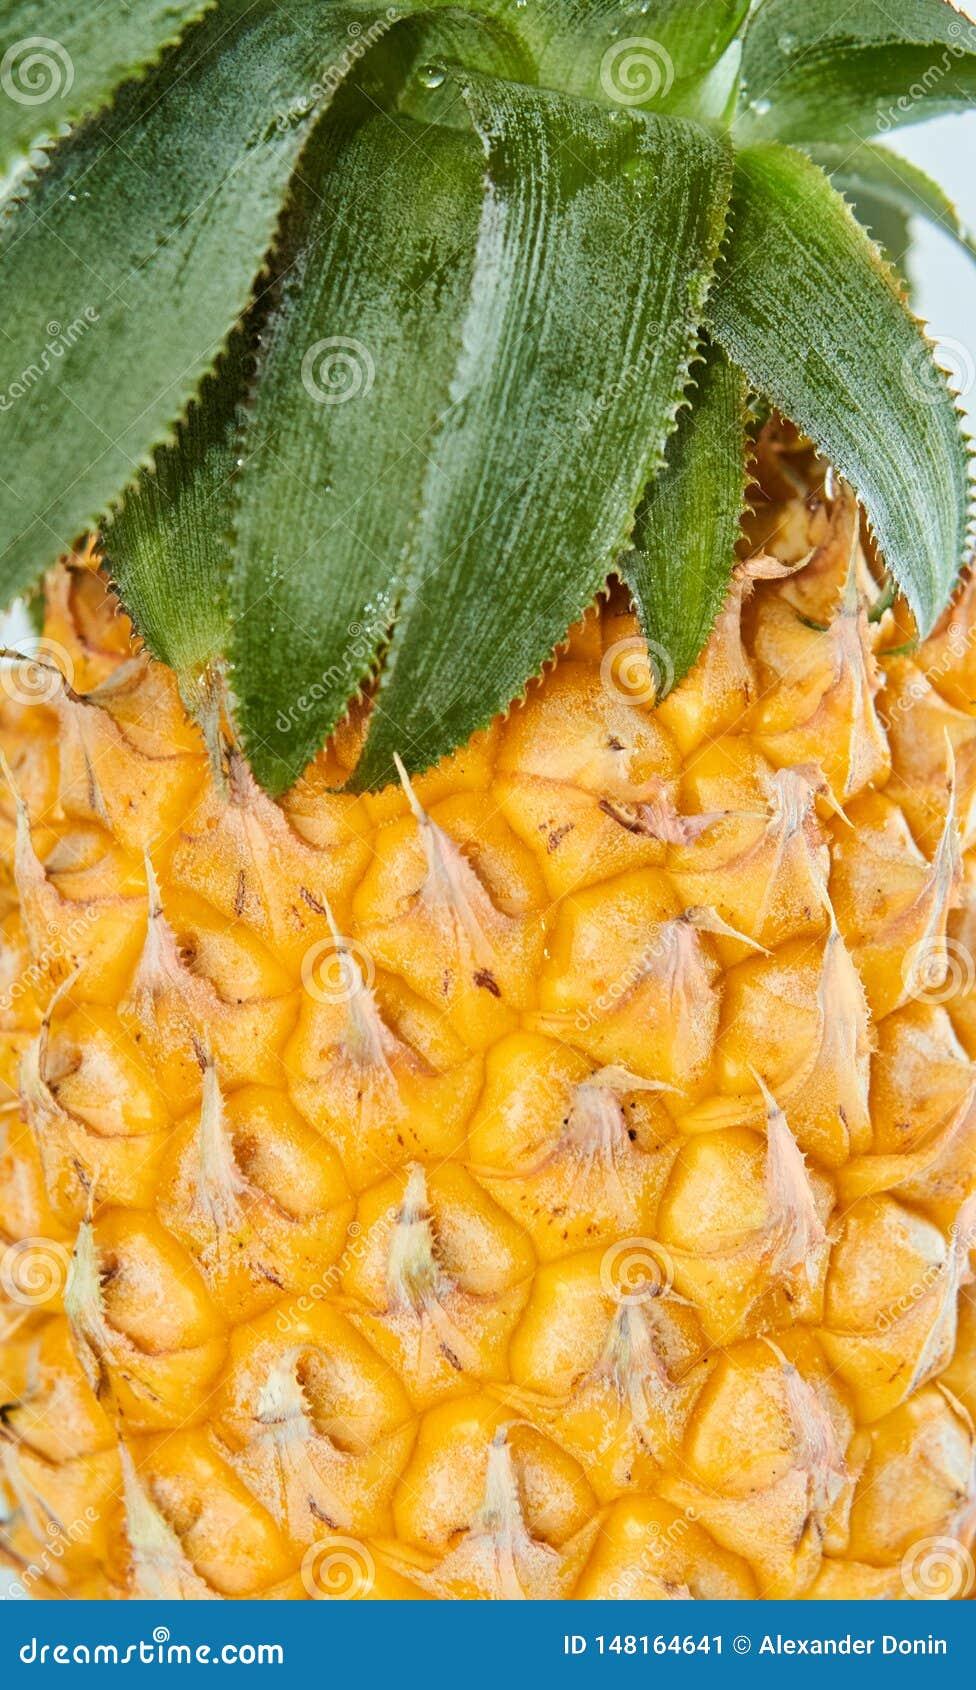 Verse ananas met groene bladeren